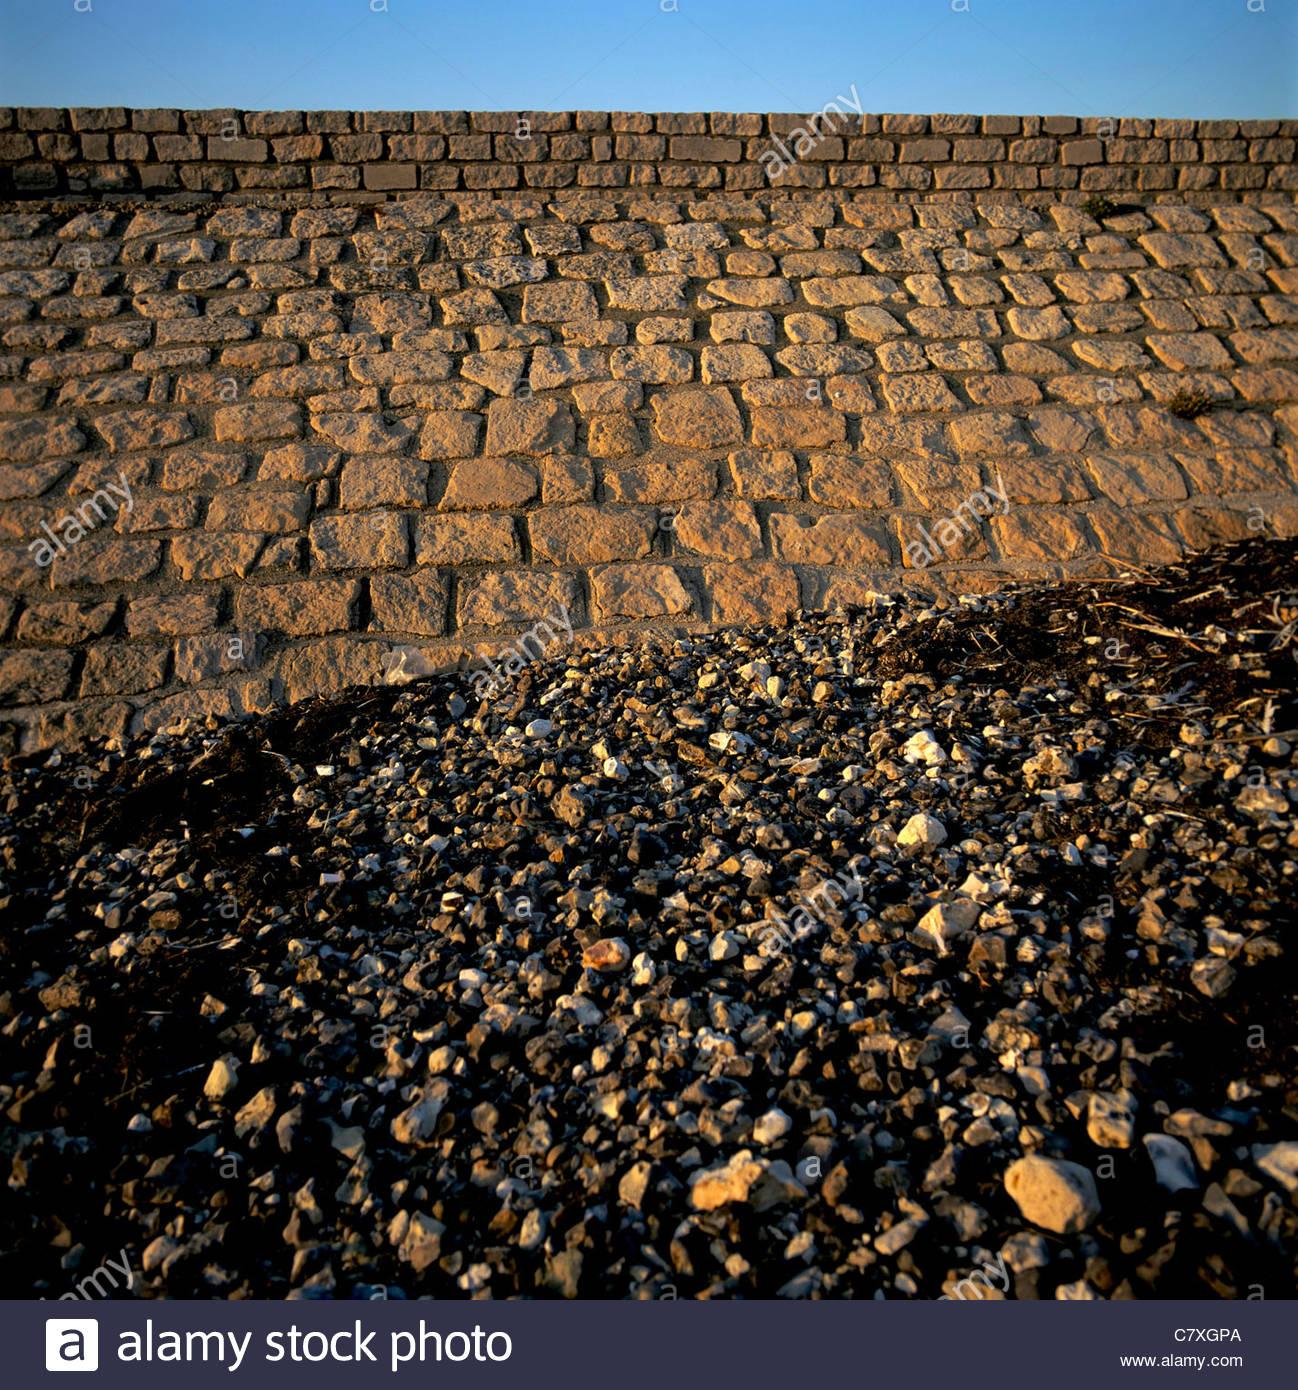 Sea wall and pebbles on beach - Stock Image